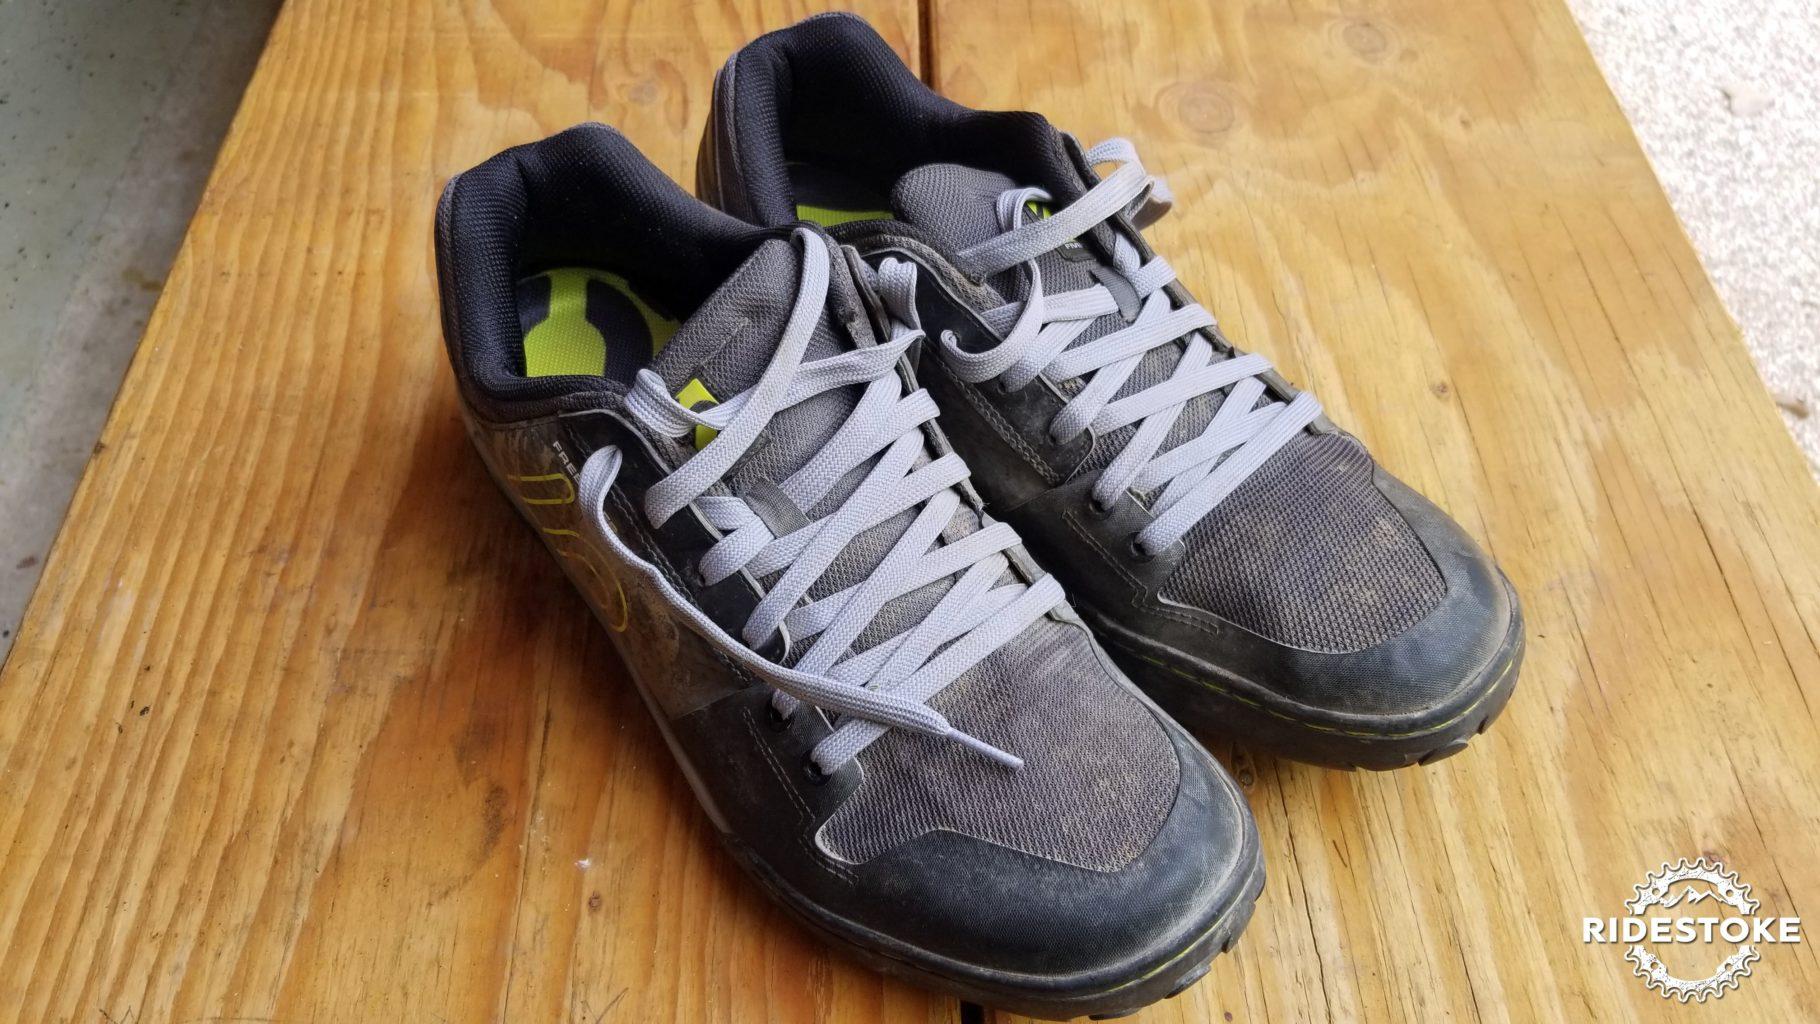 Five Ten Freerider Contact Ride Shoes